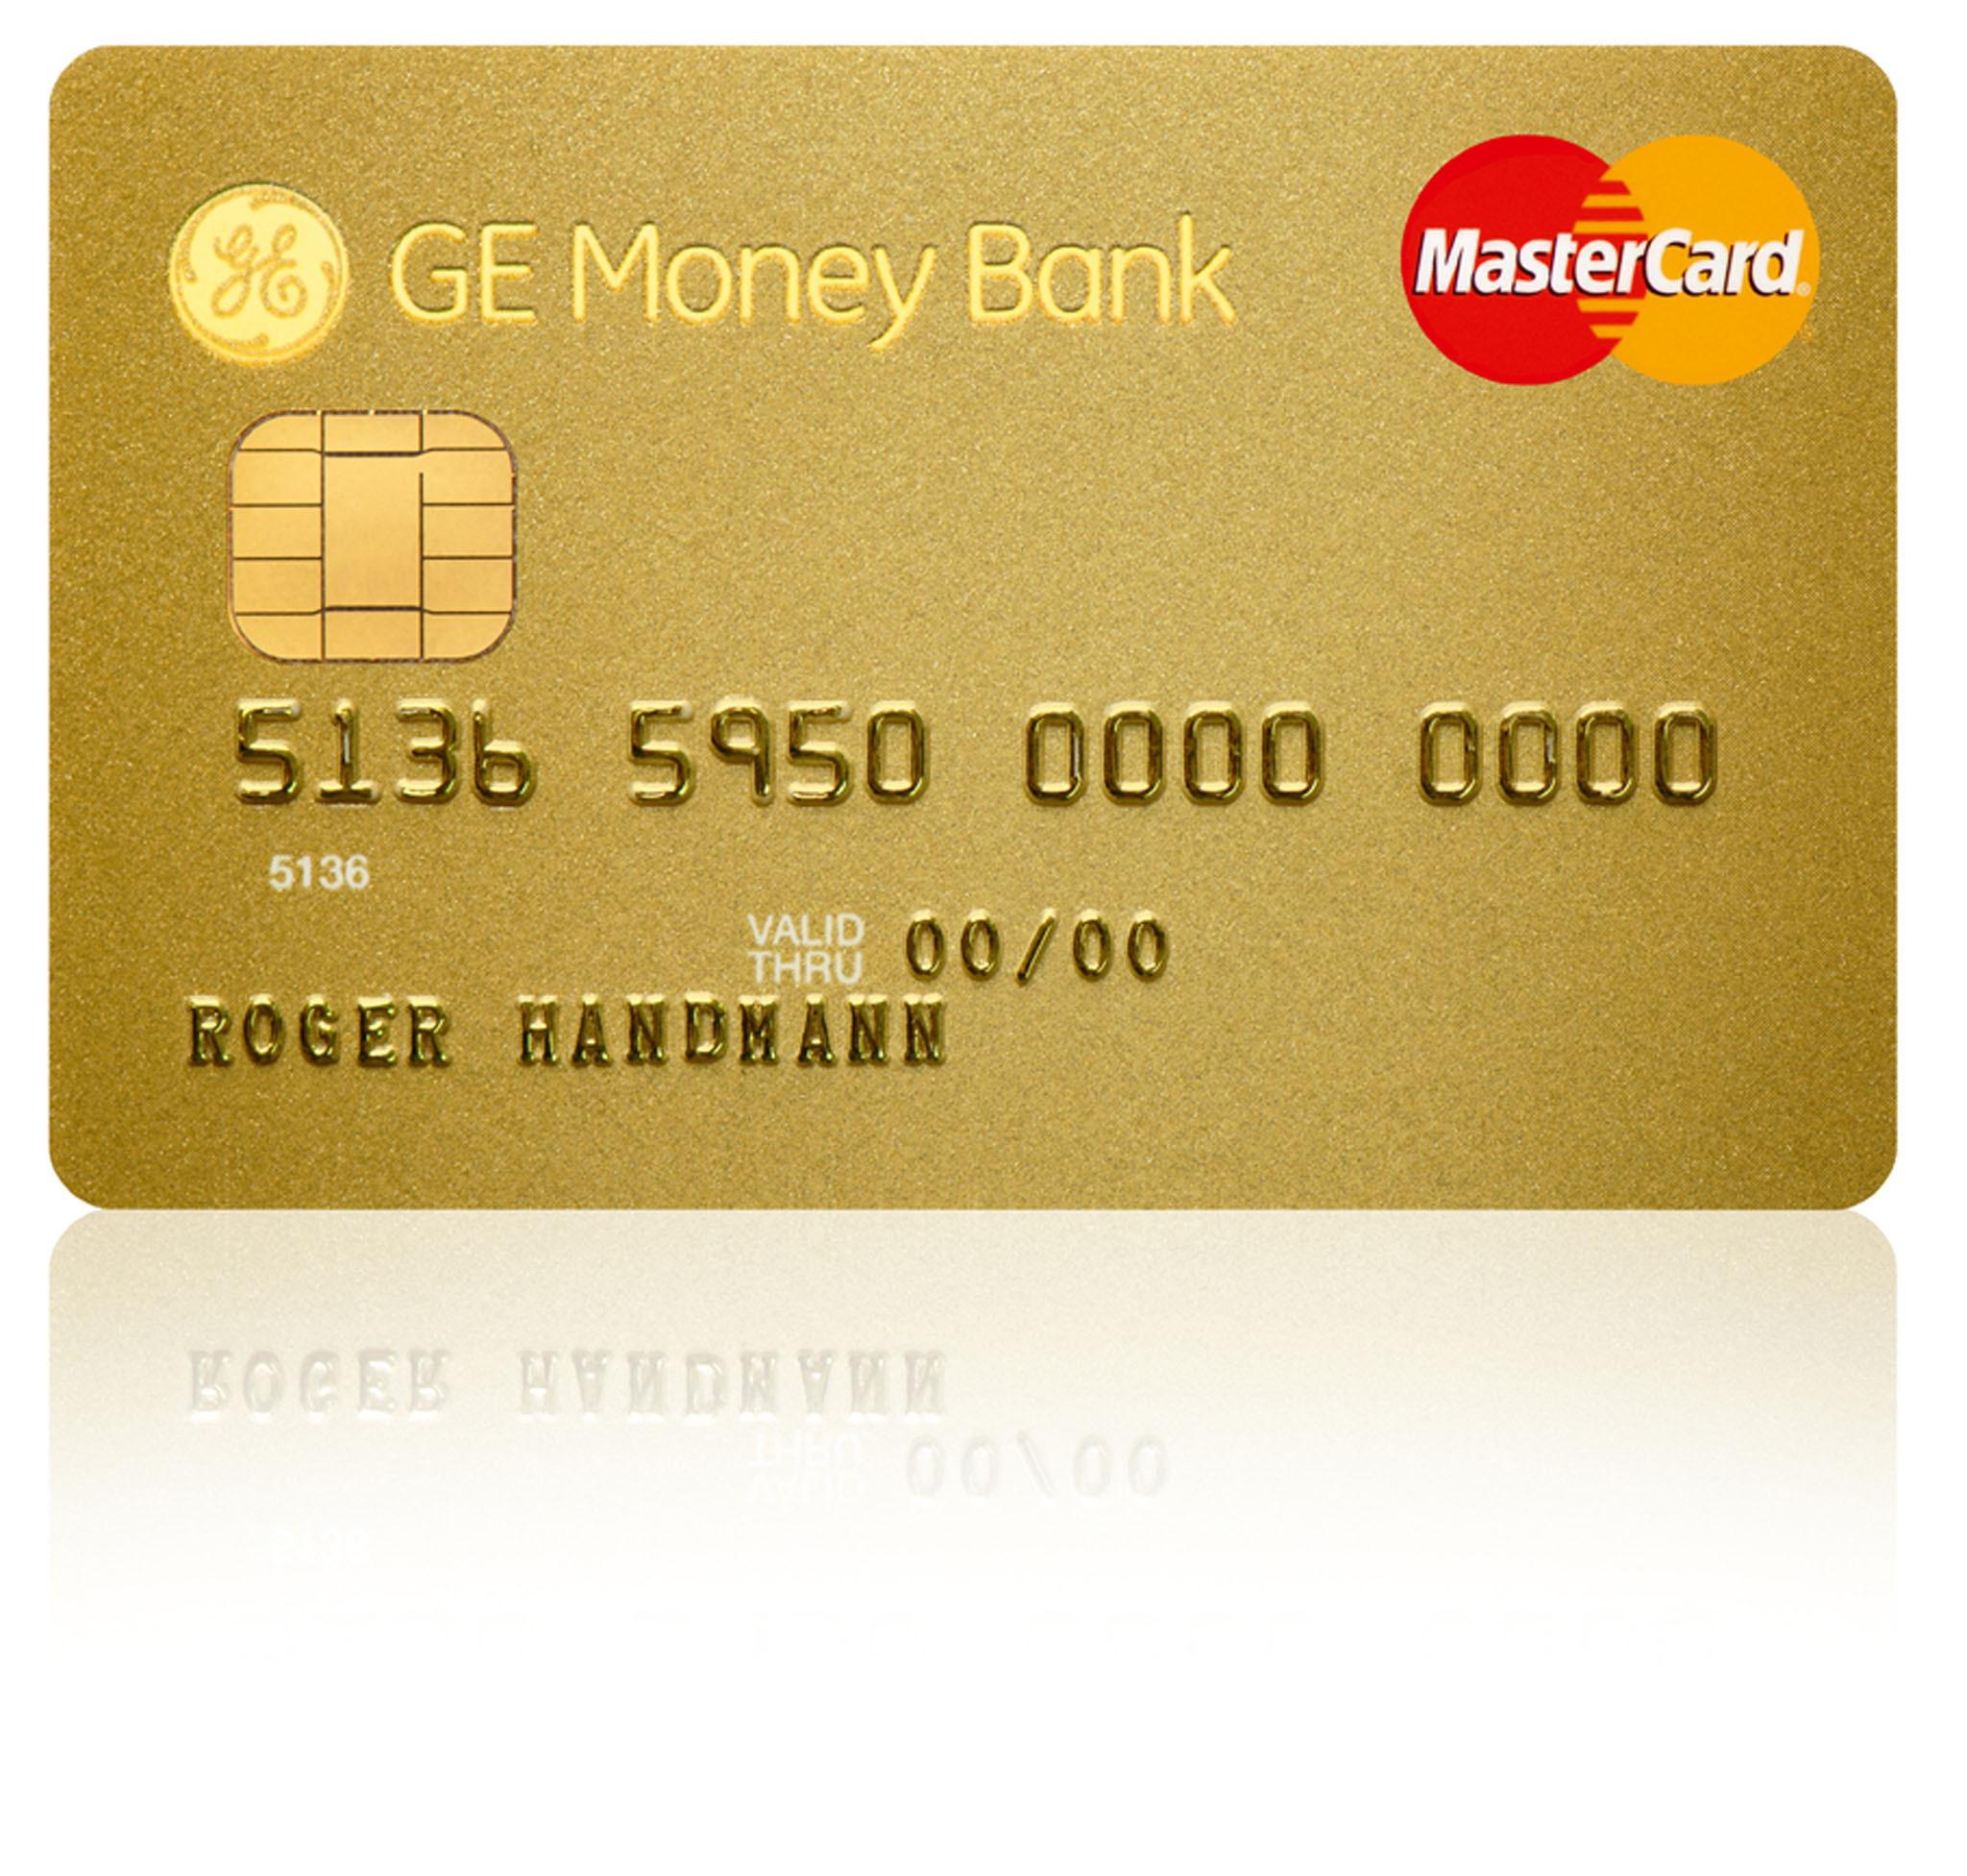 ge money bank lanciert mastercard gold und silber kreditkarten presseportal. Black Bedroom Furniture Sets. Home Design Ideas